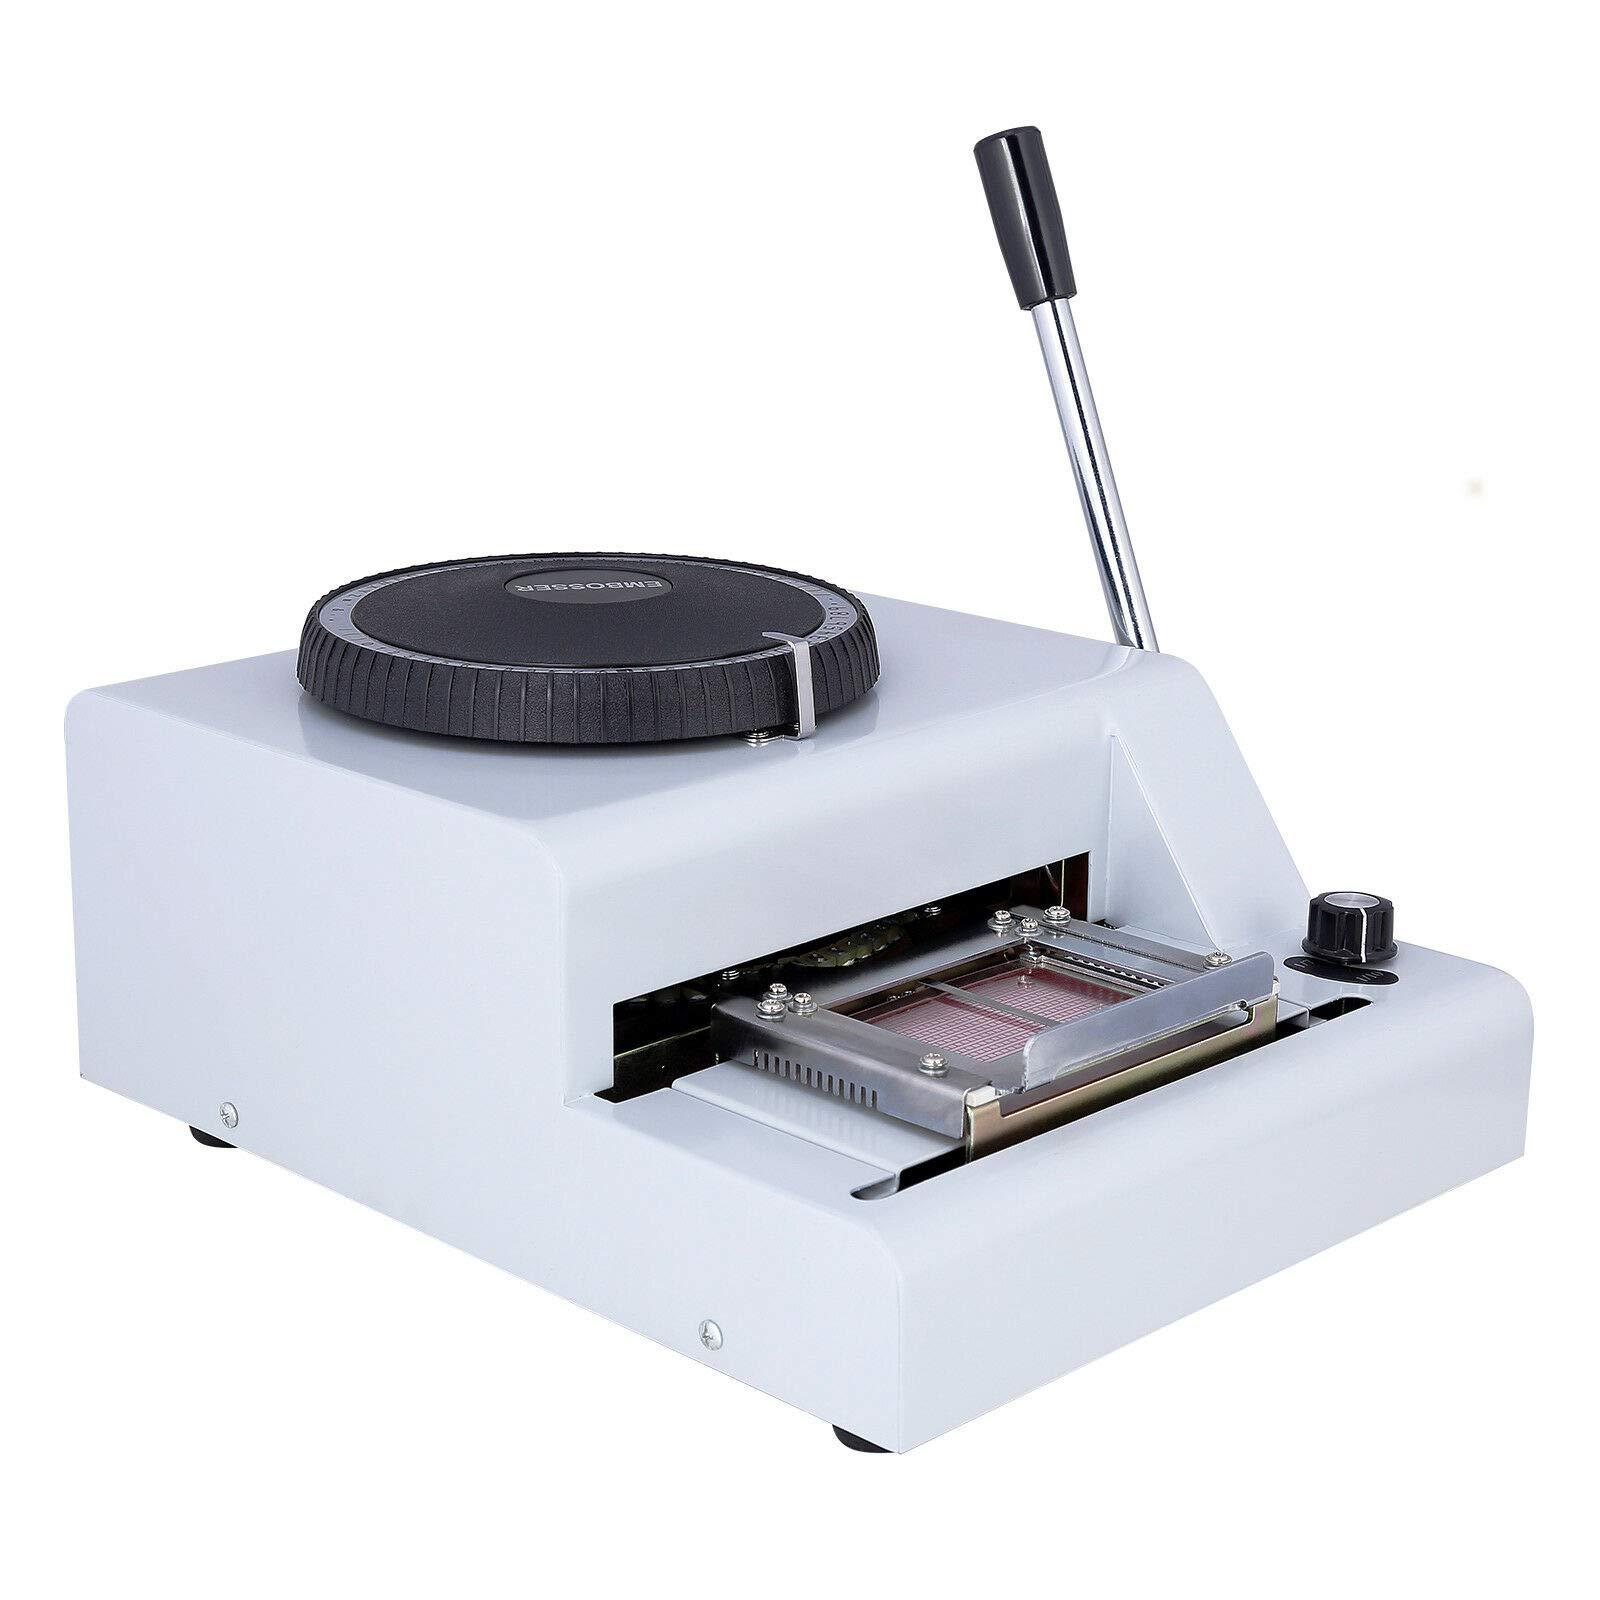 72 Character Card Embossing Machine Manual Embosser Stamping Machine for PVC Credit Bank VIP ID Membership Gift Card